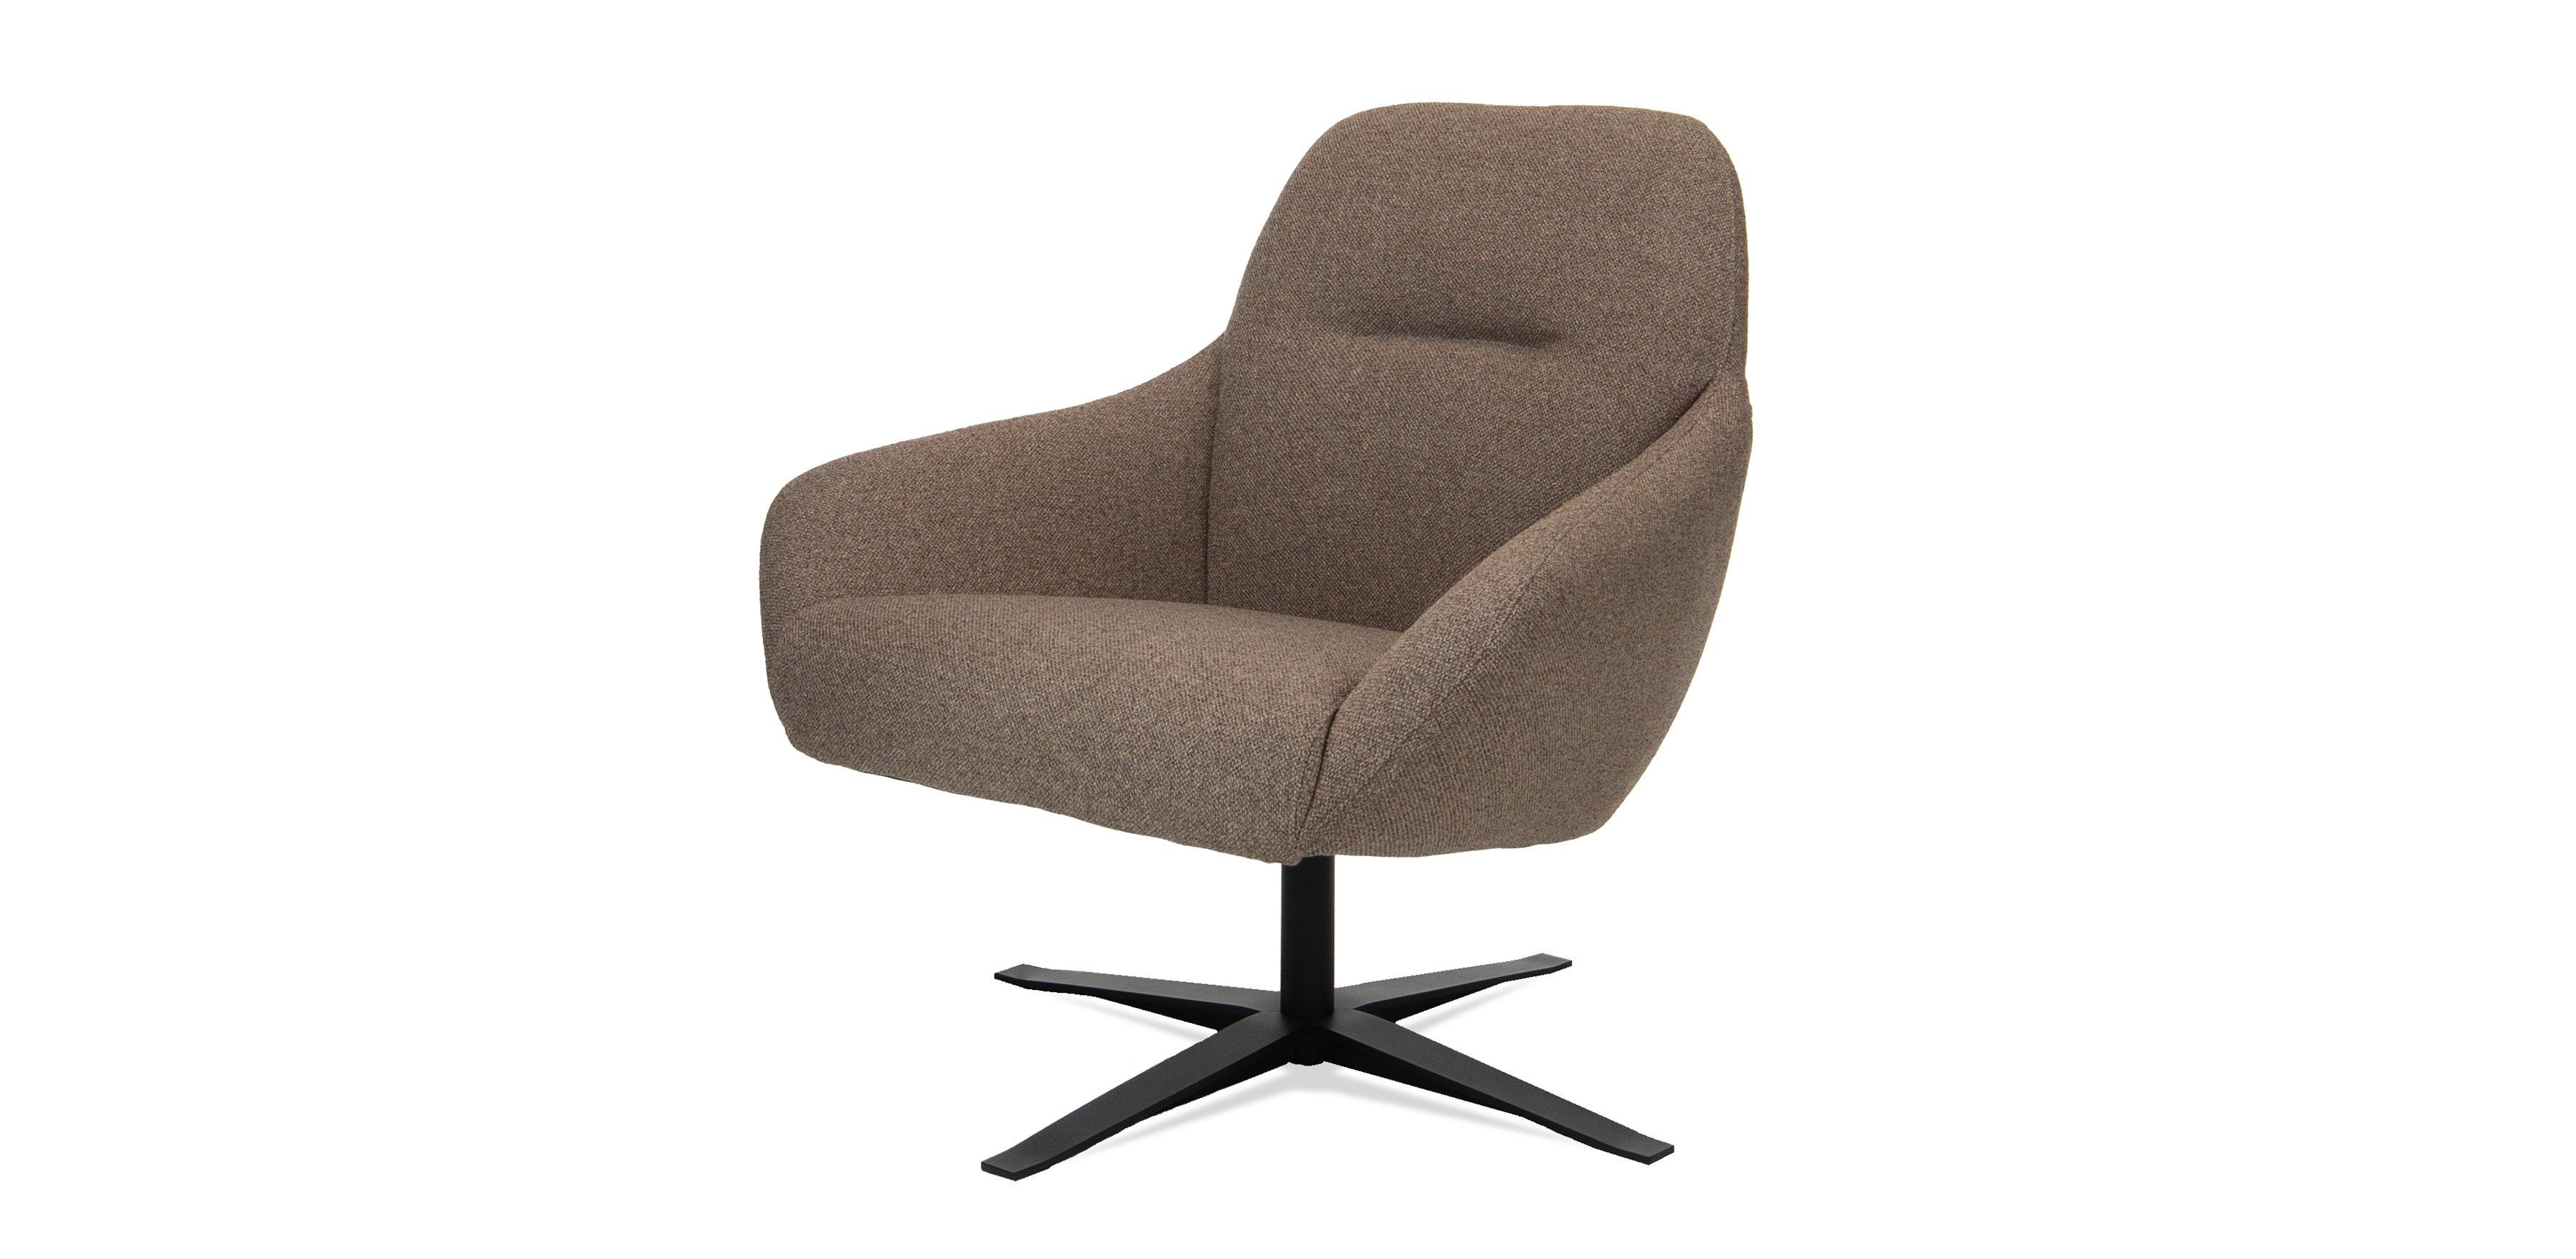 Python fauteuil DYYK 3580x1750 3